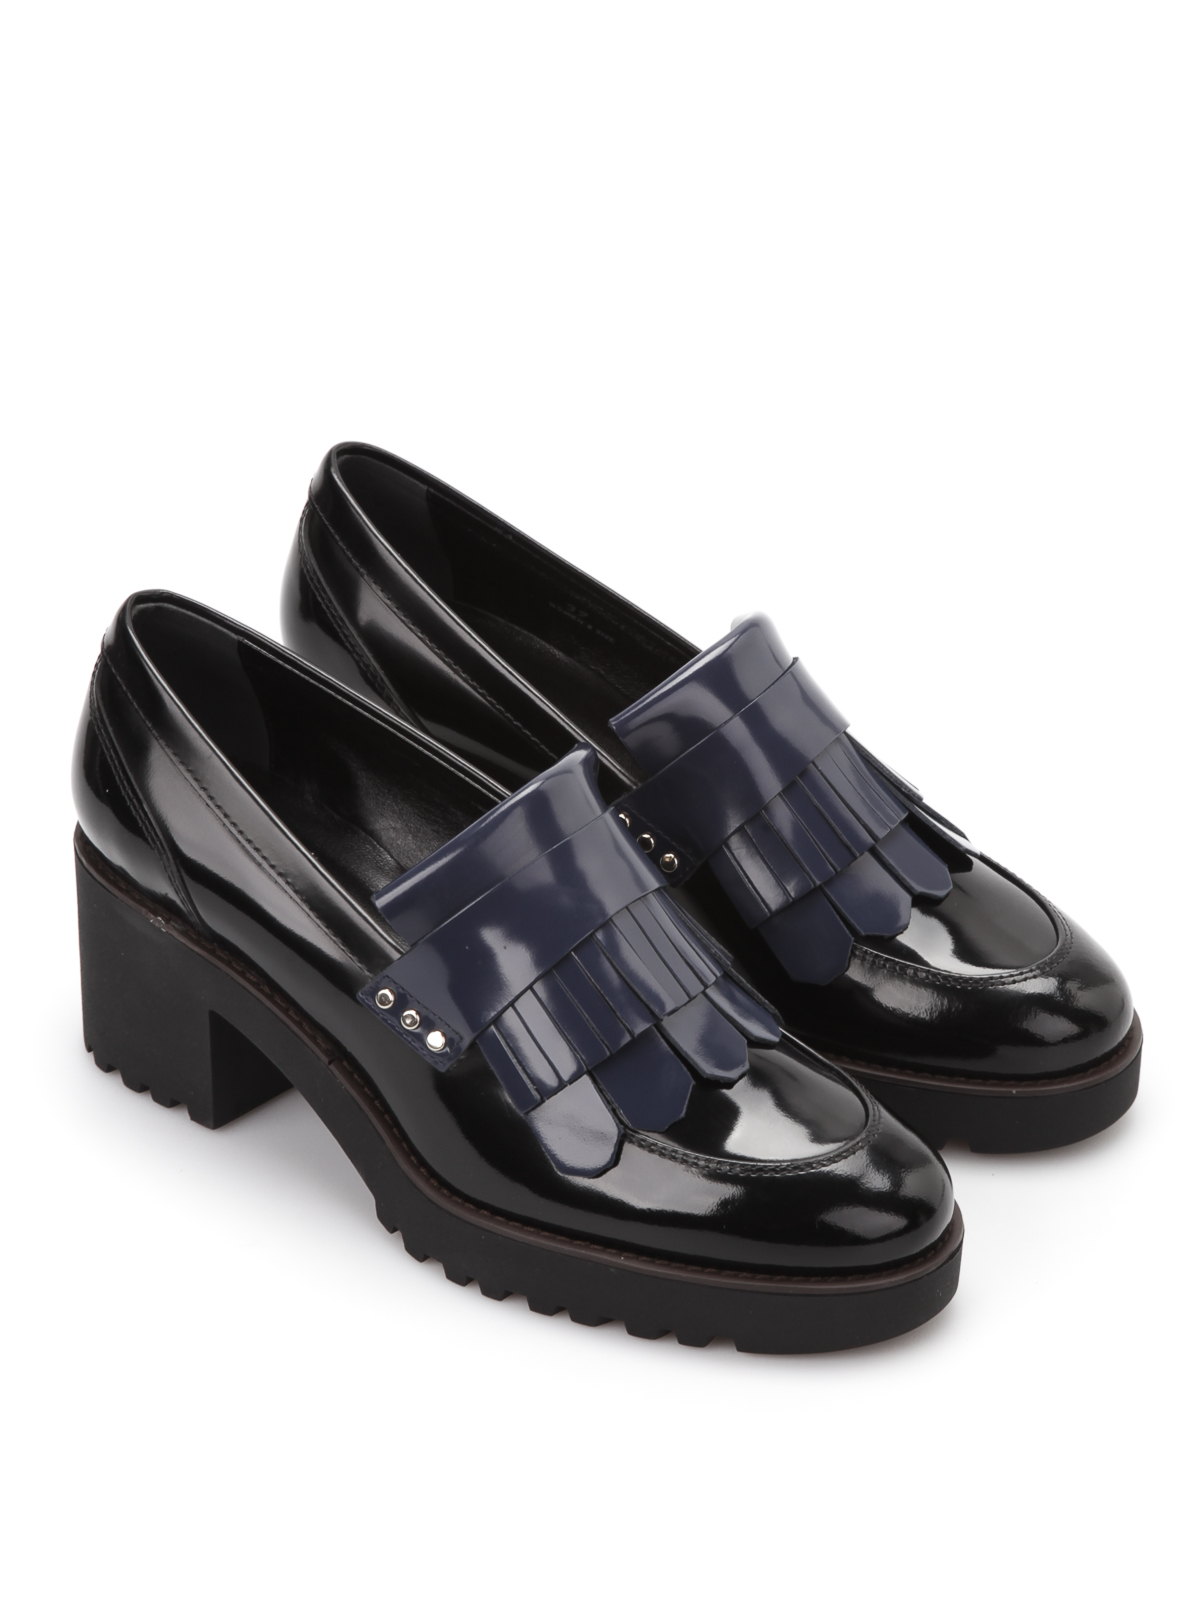 Mocassini e slippers Hogan - Mocassini con tacco - HXW2770T31098A081F